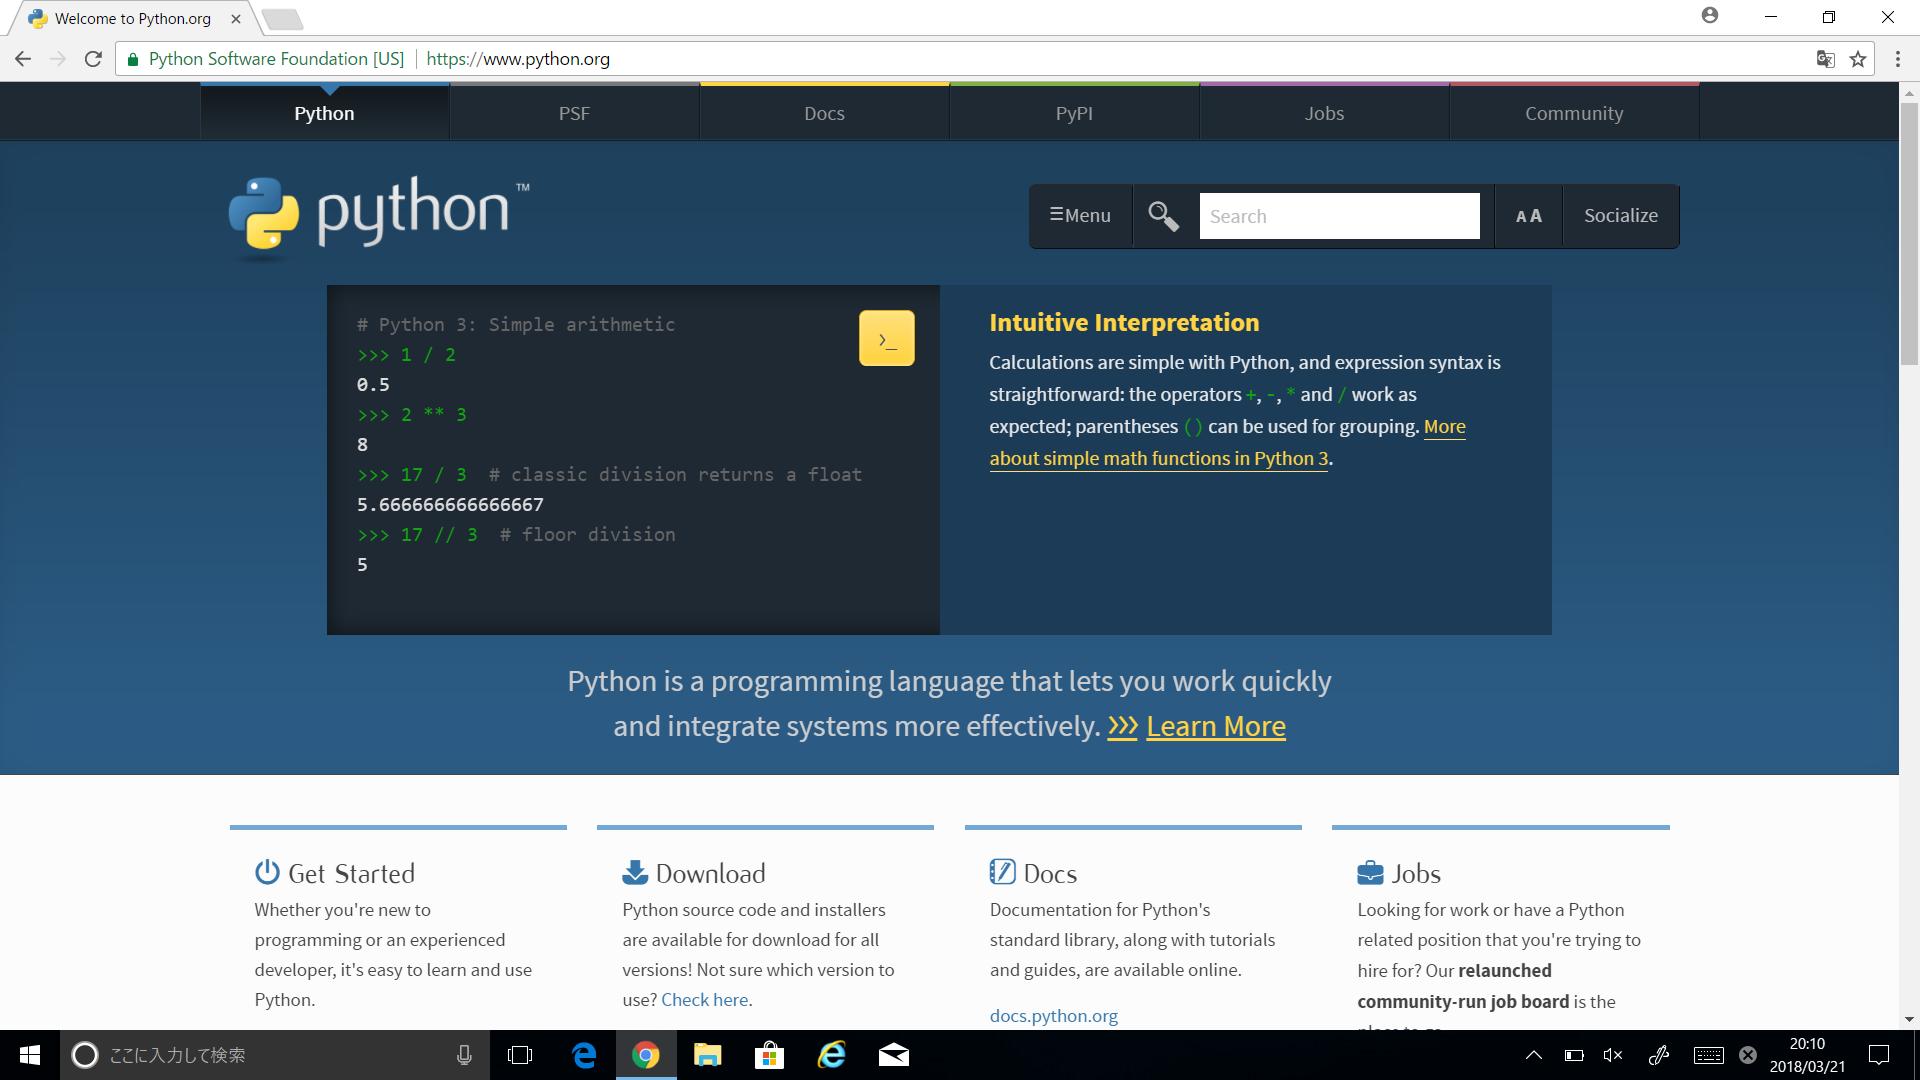 python.org.png